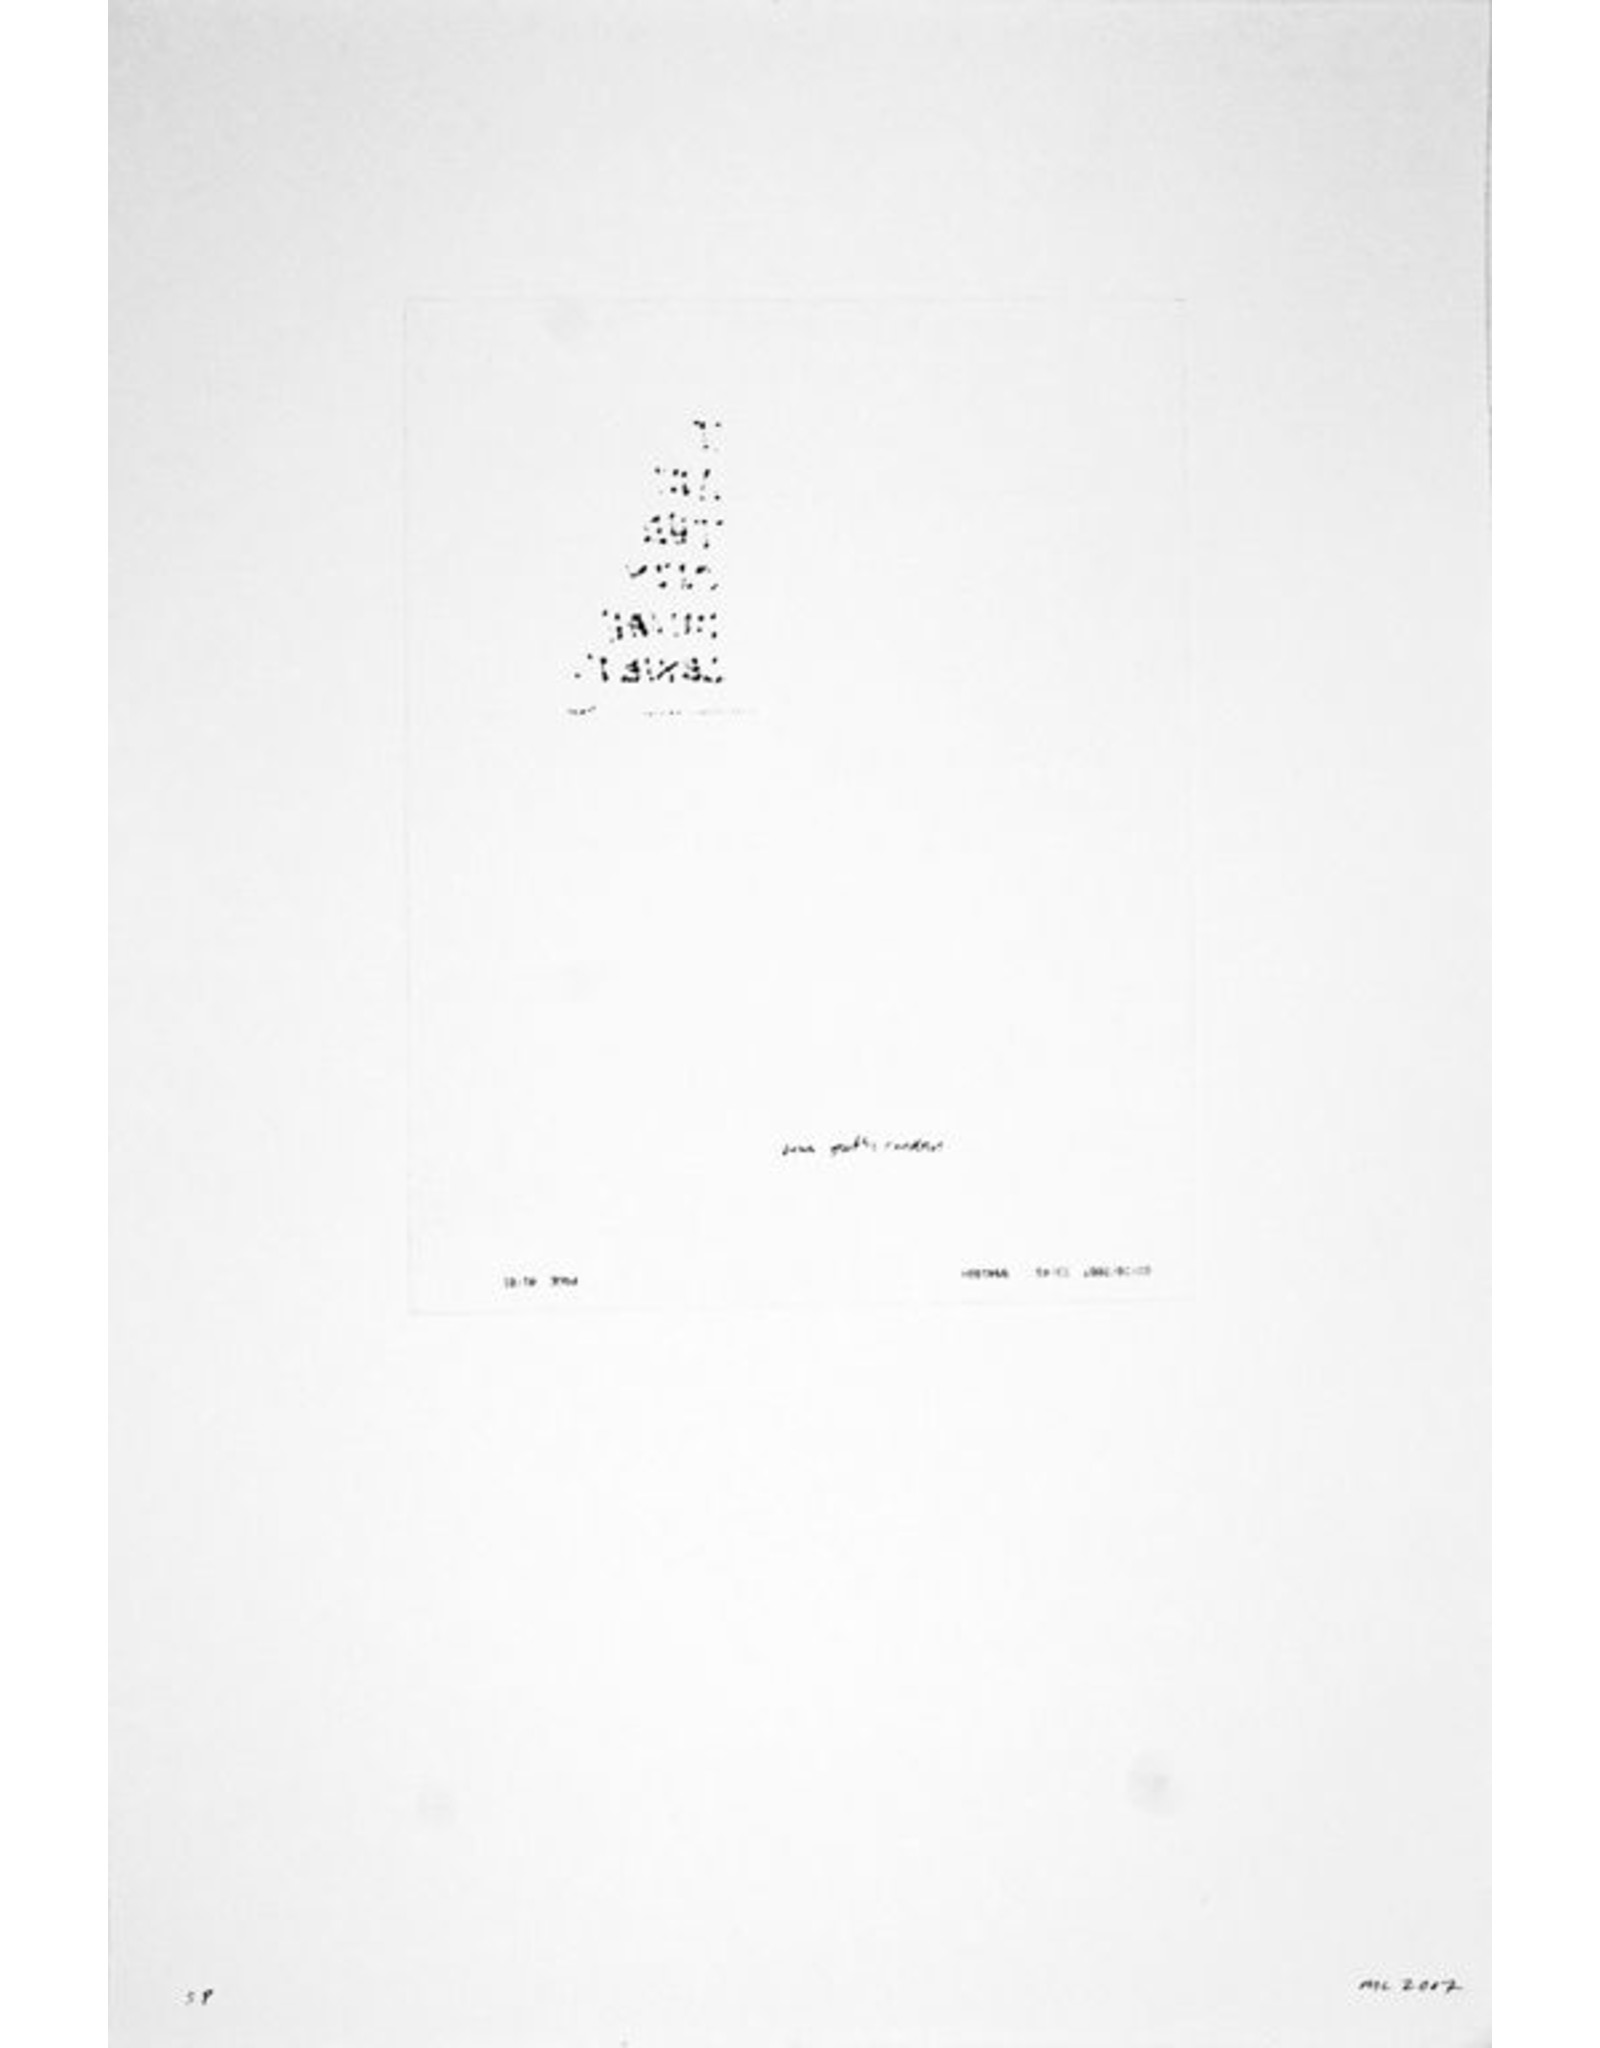 Lexier, Micah A Sentence (fax)